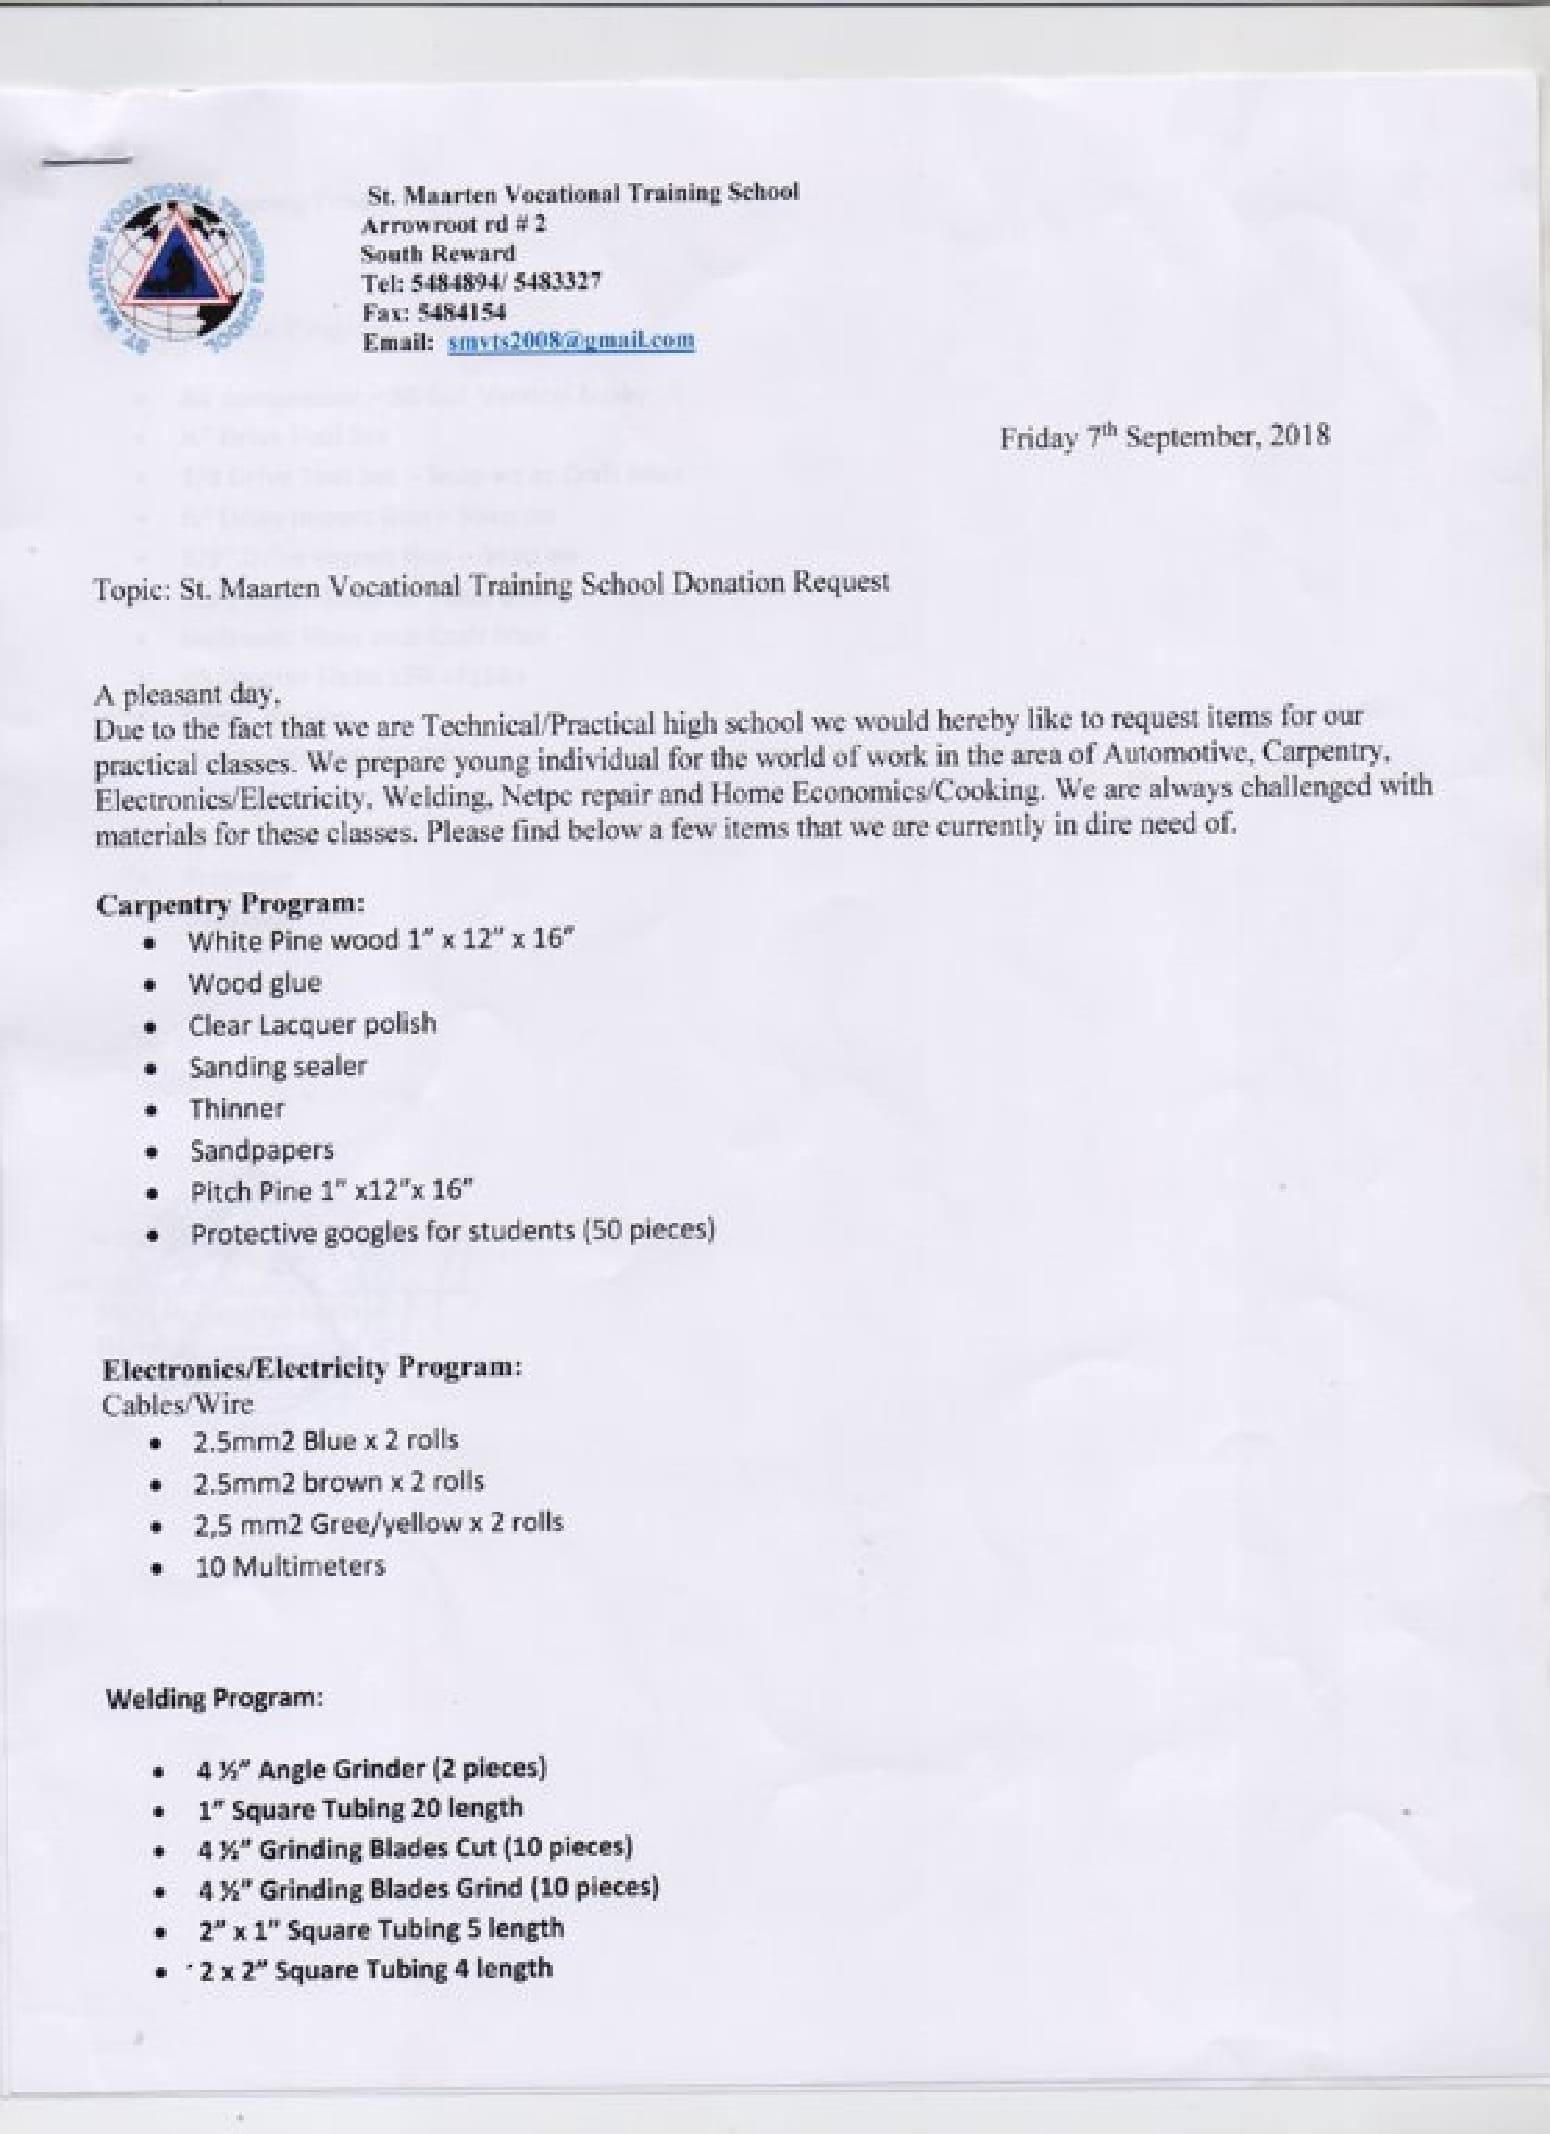 06-Devis Vocational Training School-1.jpg